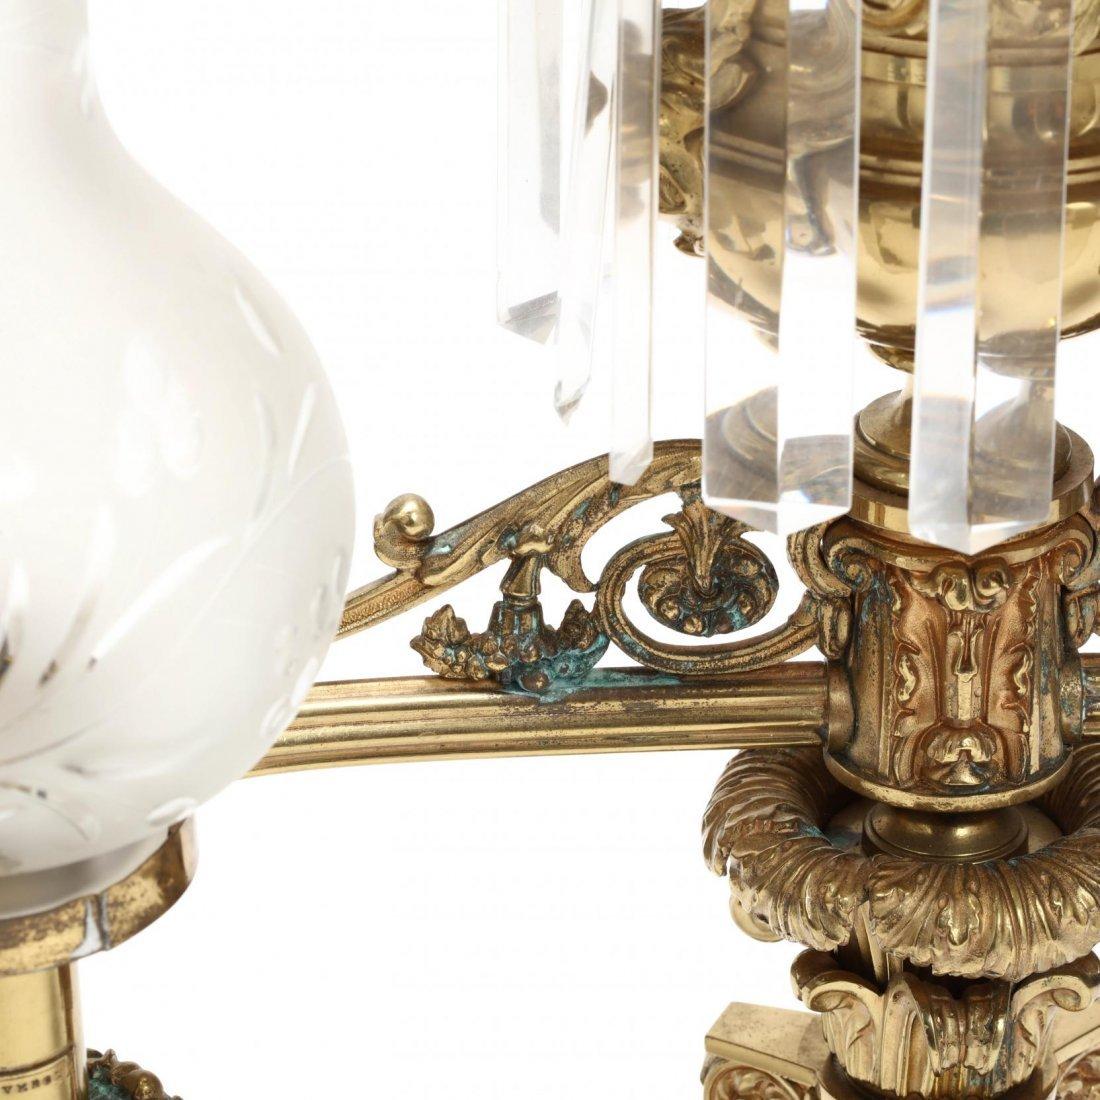 Lewis Veron & Co., Pair of Argand Lamps - 8